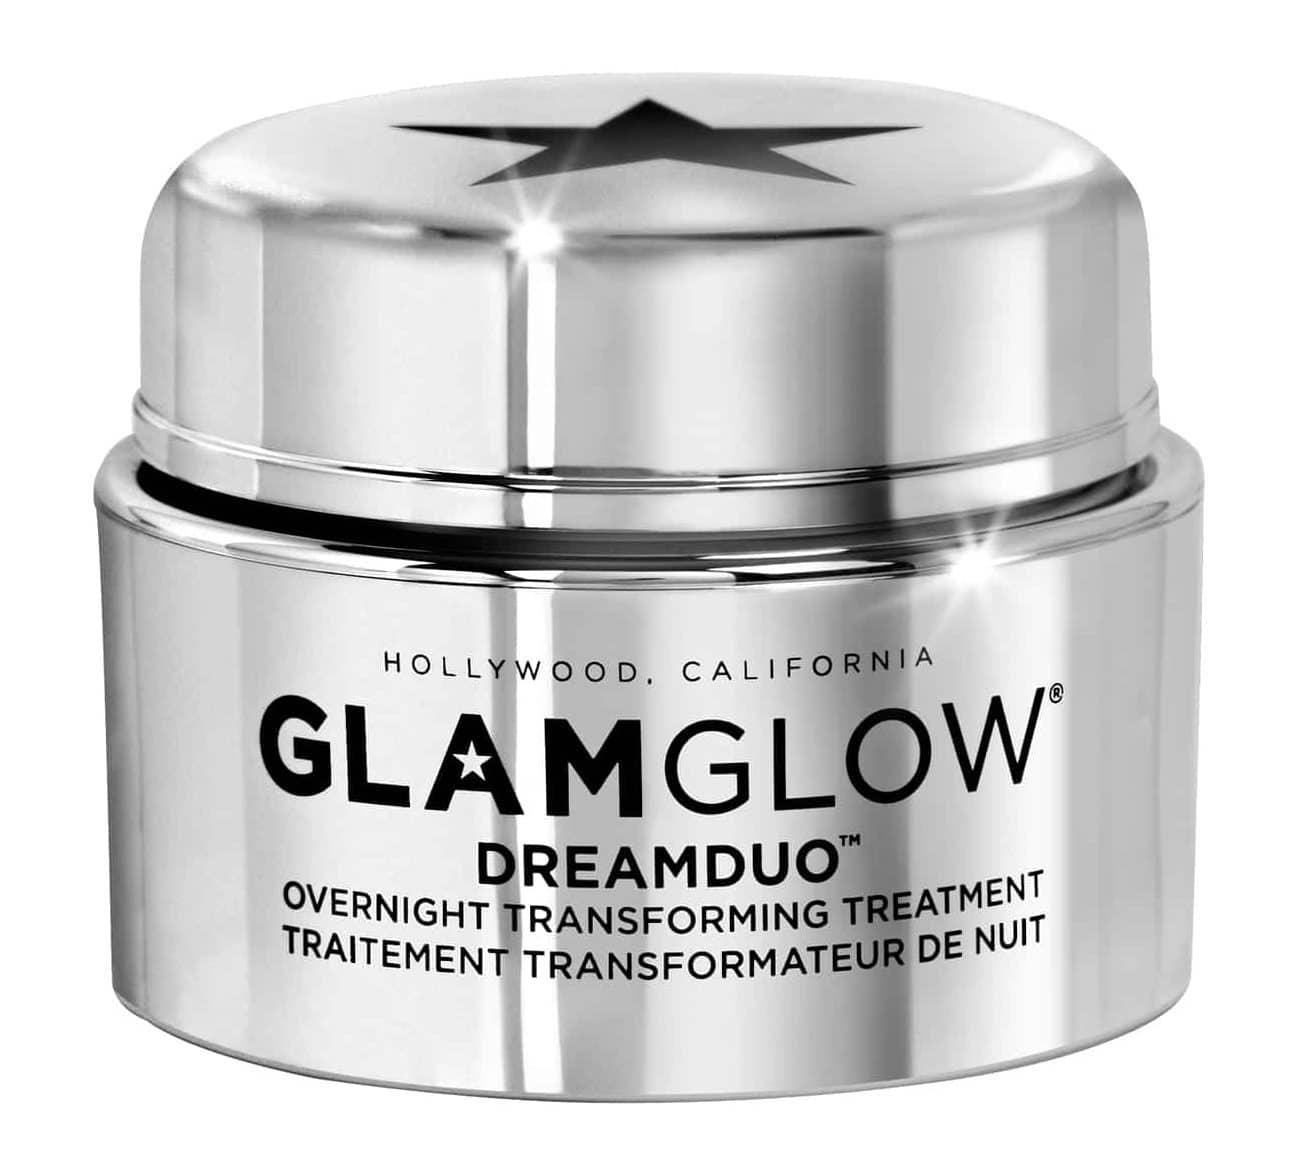 About Beauty GlamGlow DreamDuo